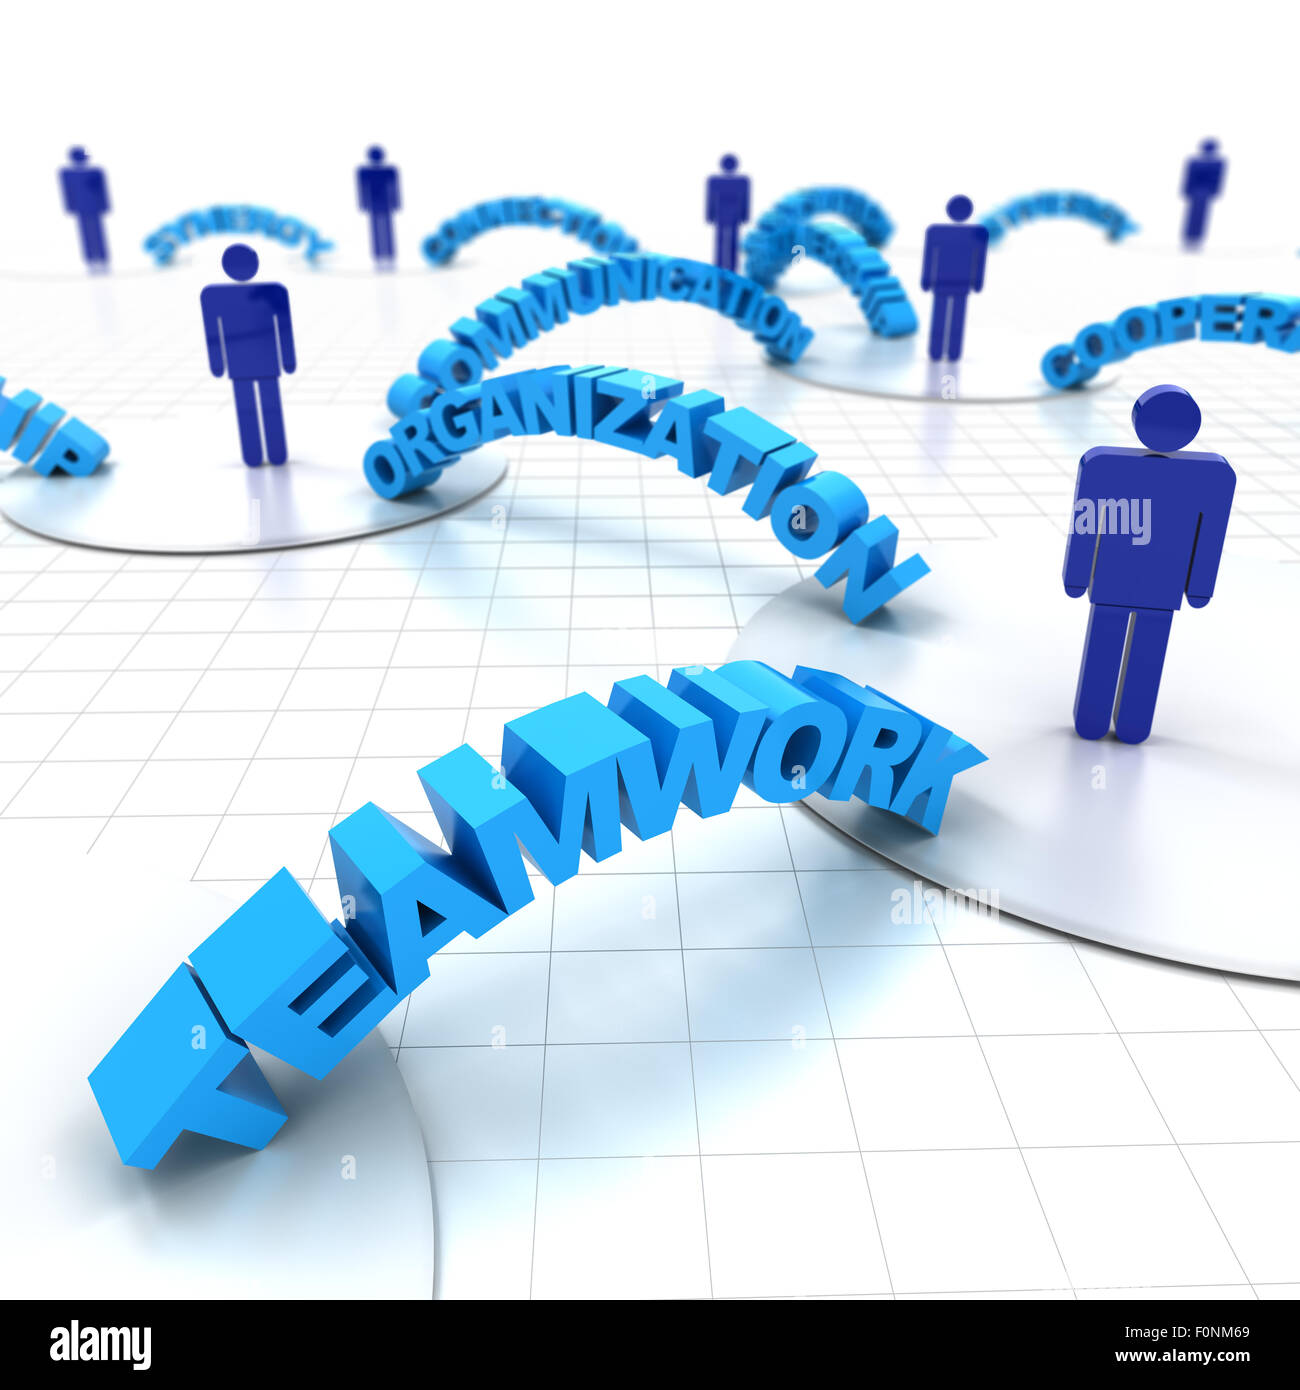 Business teamwork - Stock Image